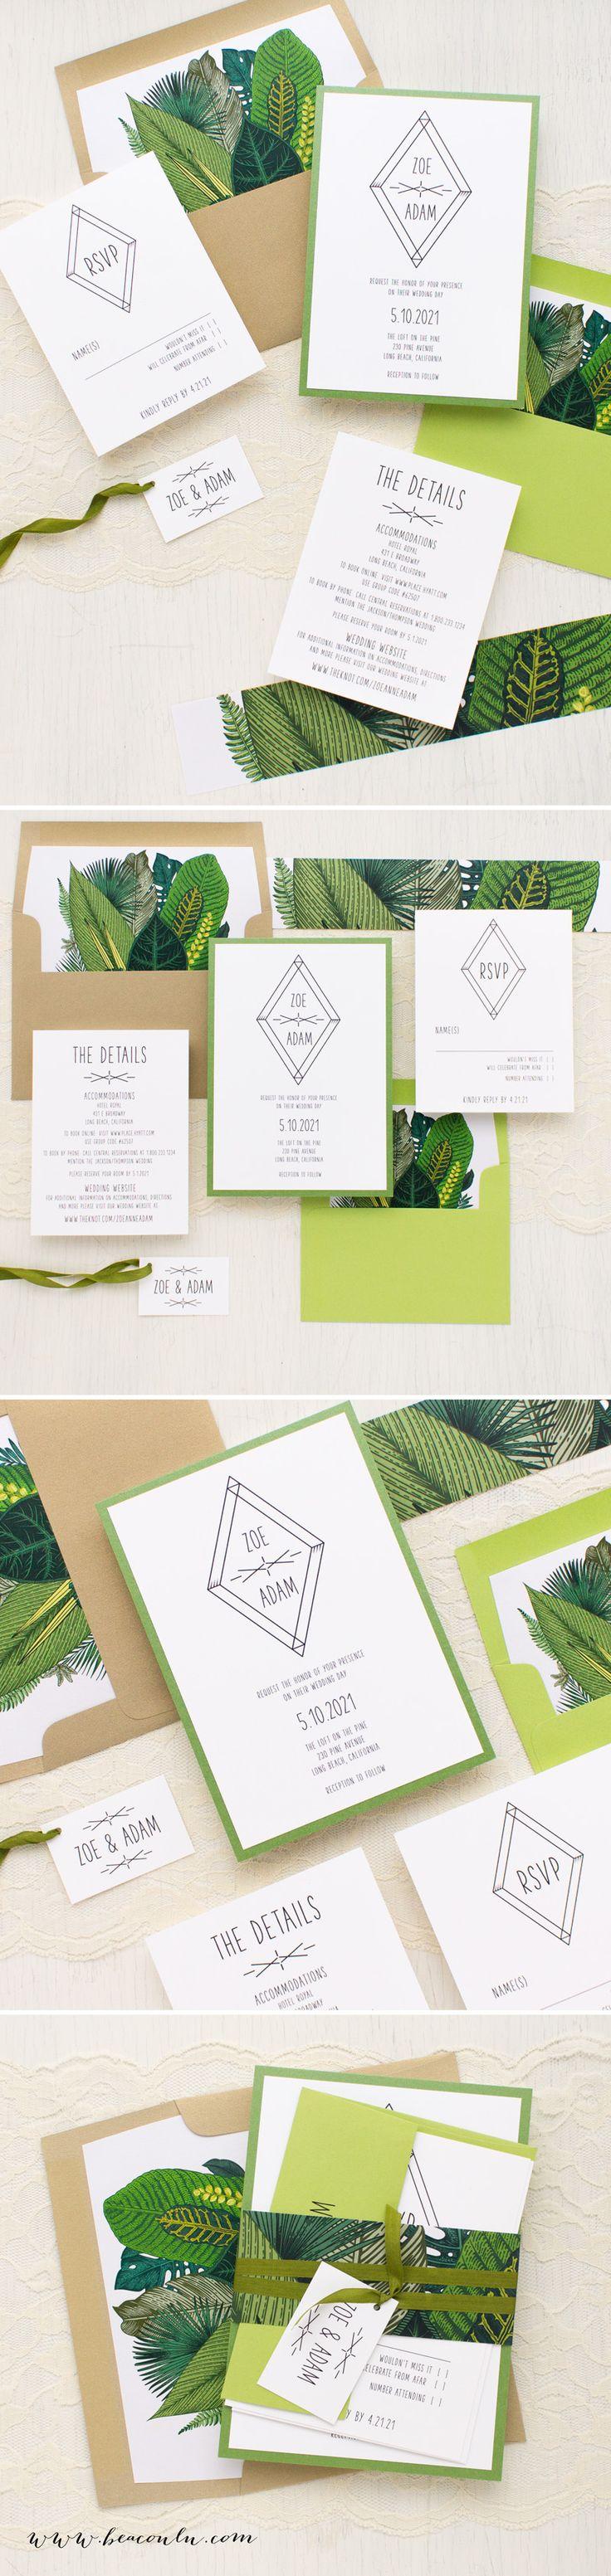 Green and gold modern boho inspired Tropical